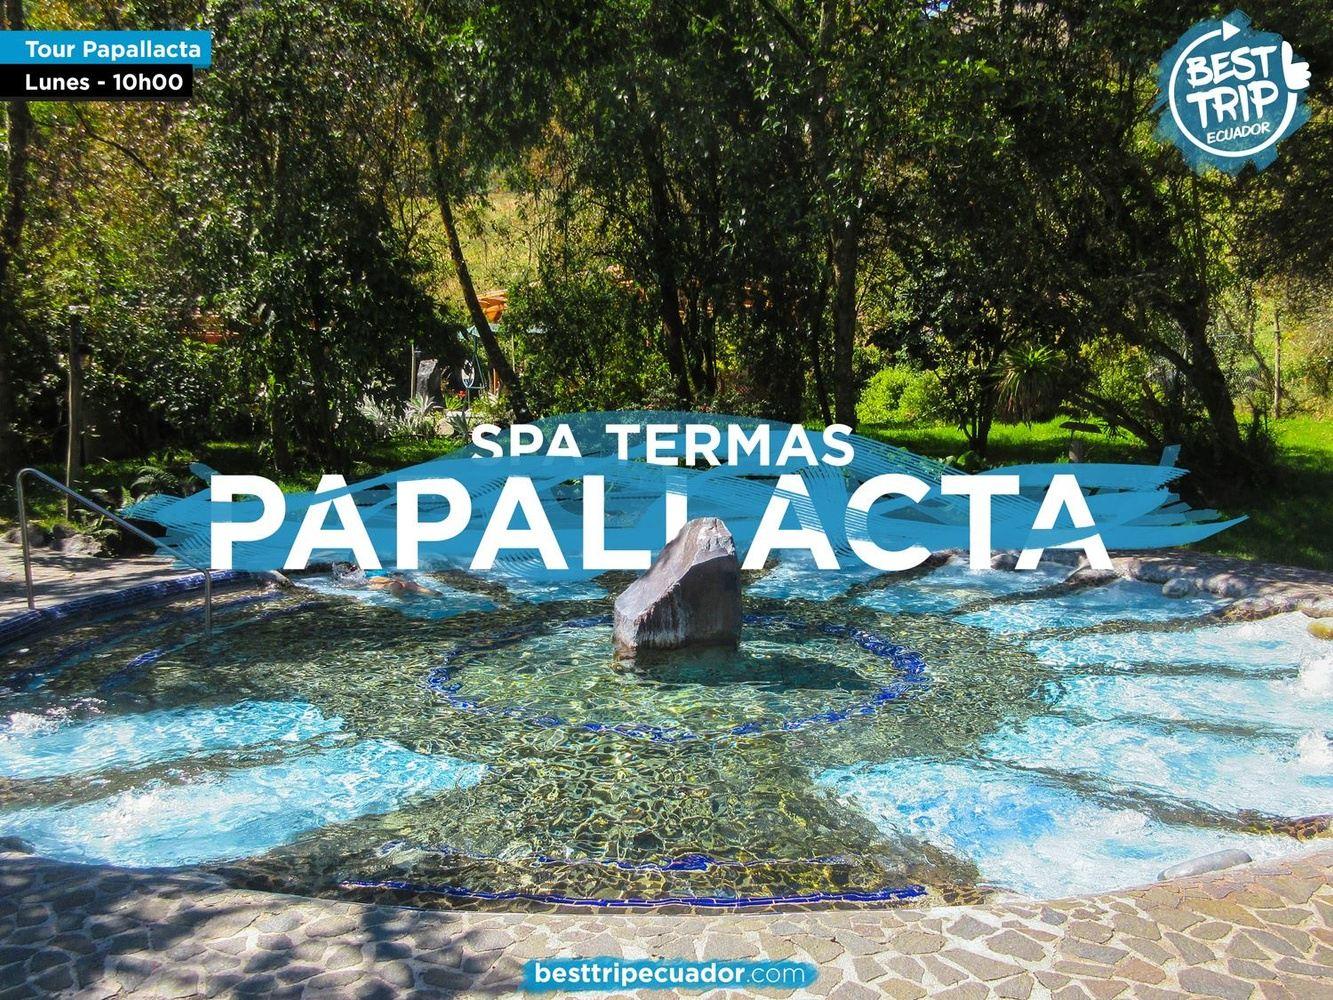 PAPALLACTA TOUR